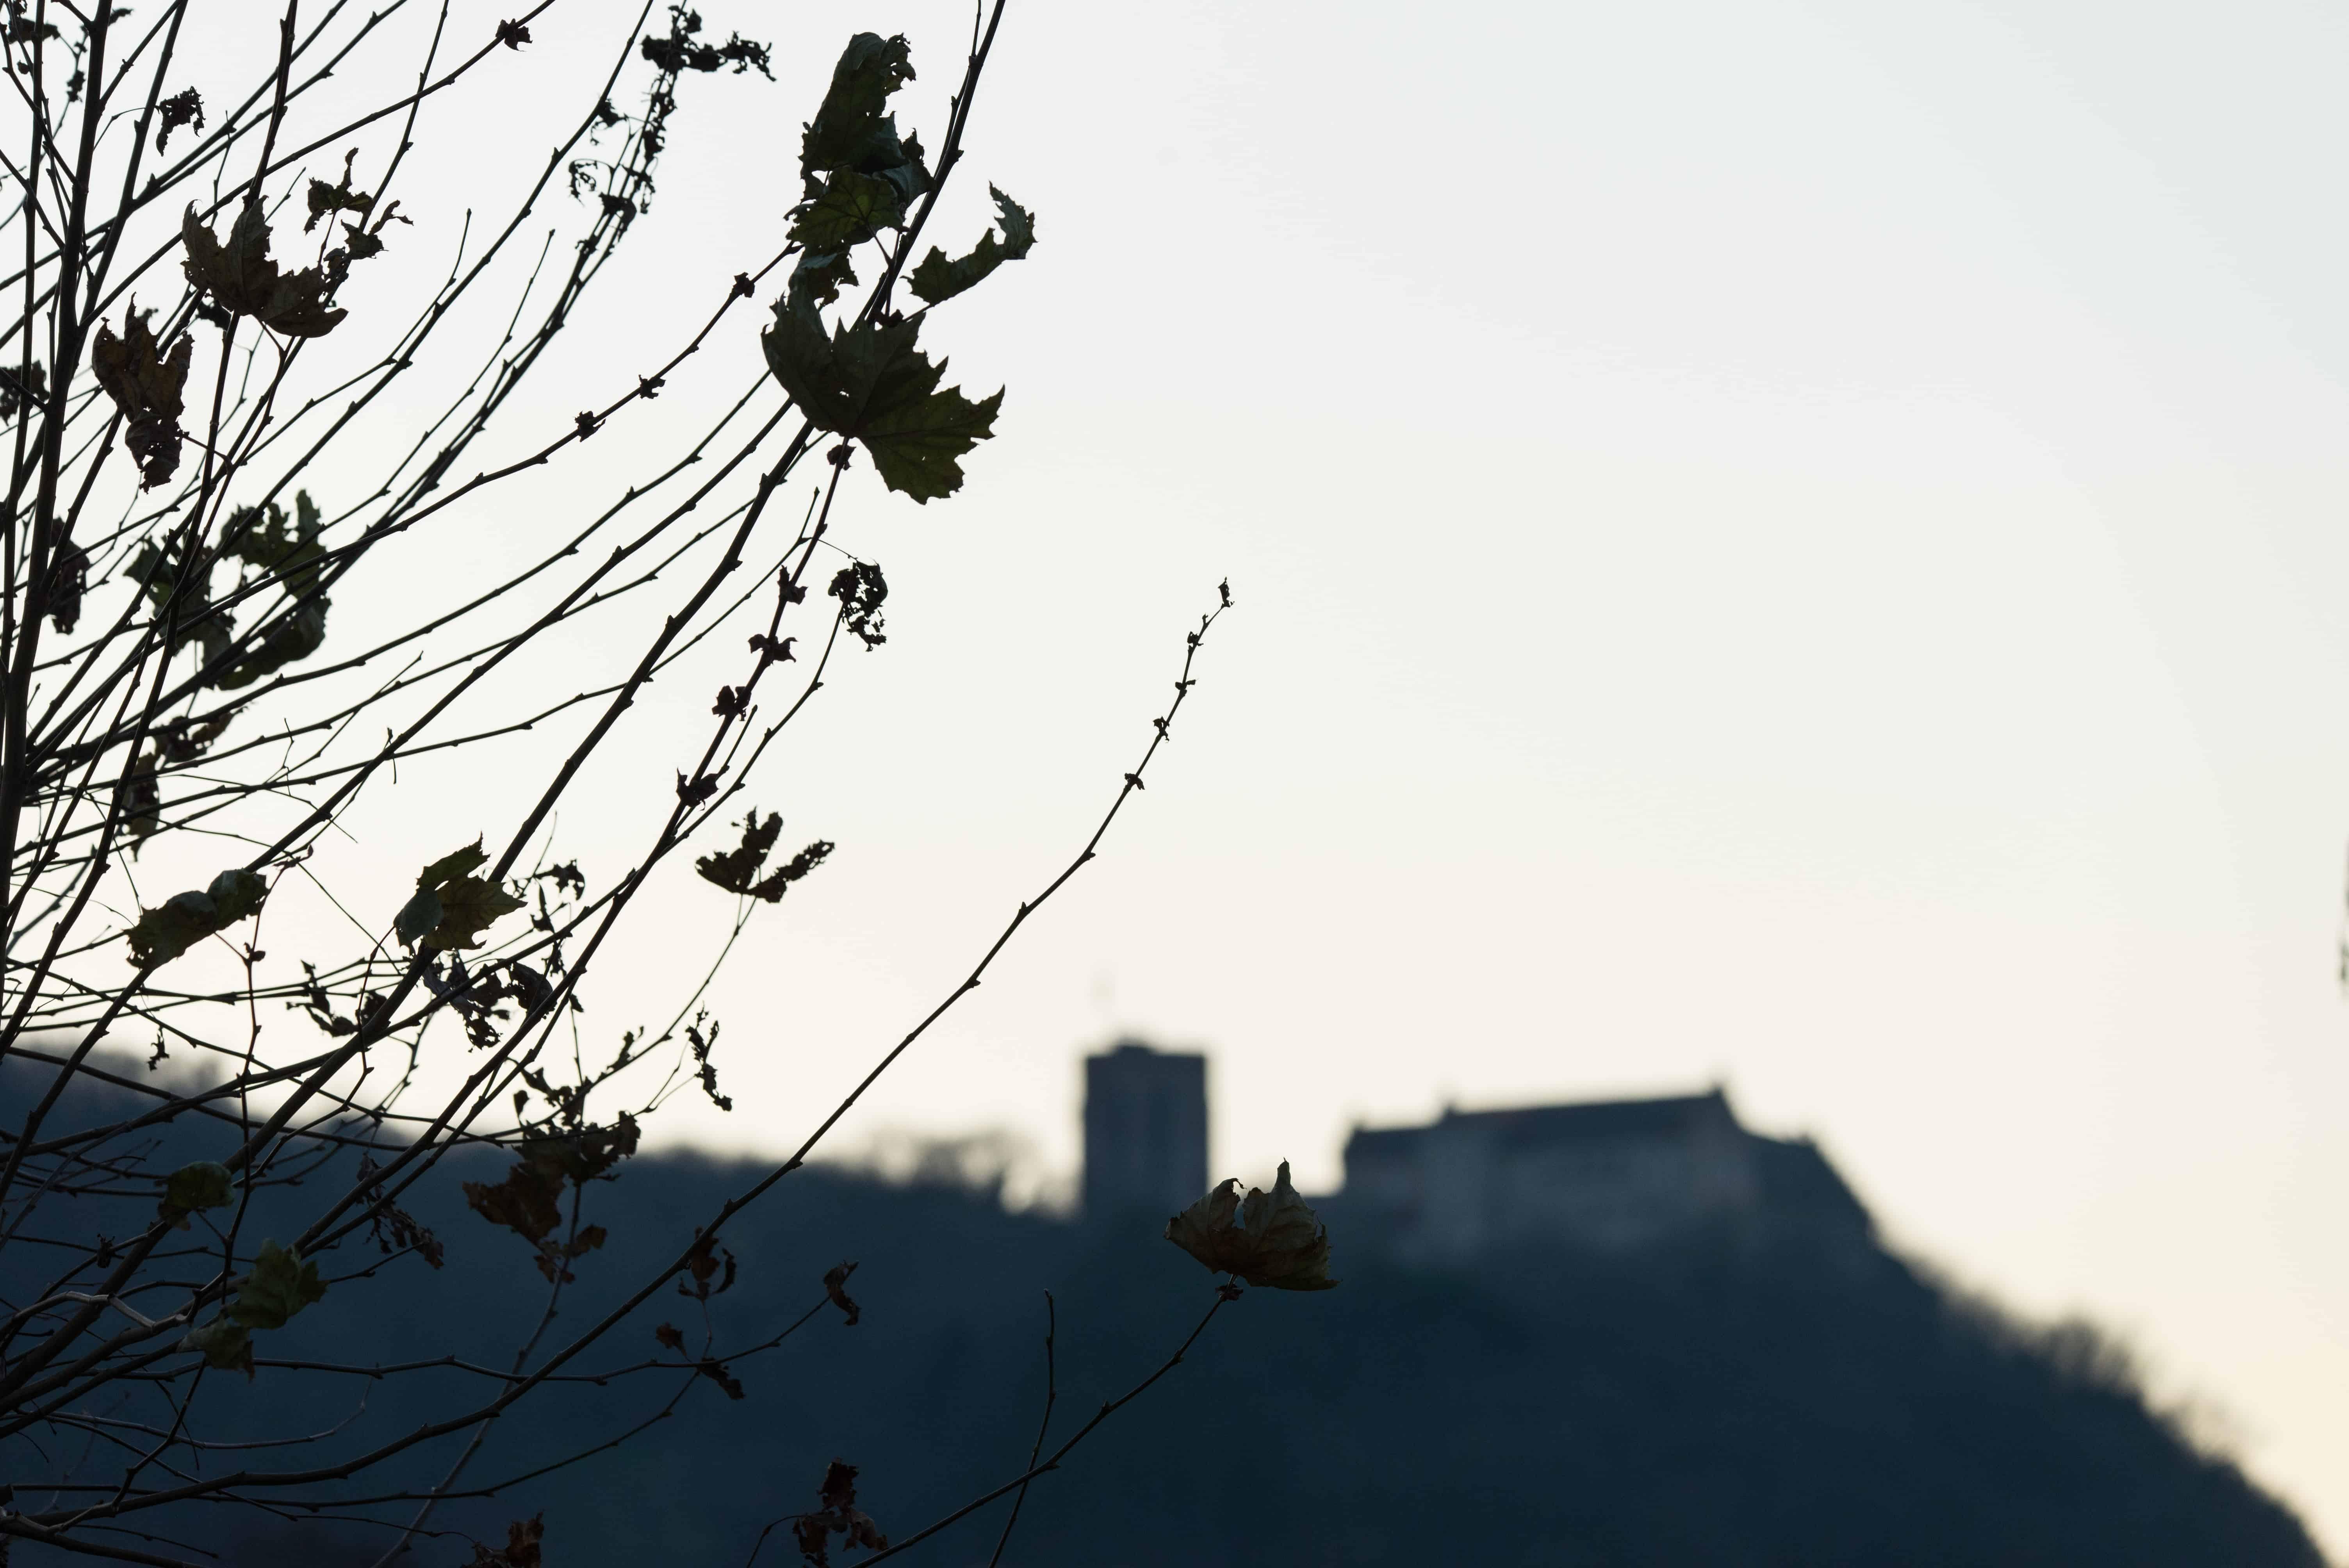 Schloss Saaleck bei Hammelburg, Objektiv: Sigma 100-400 mm Contemporary